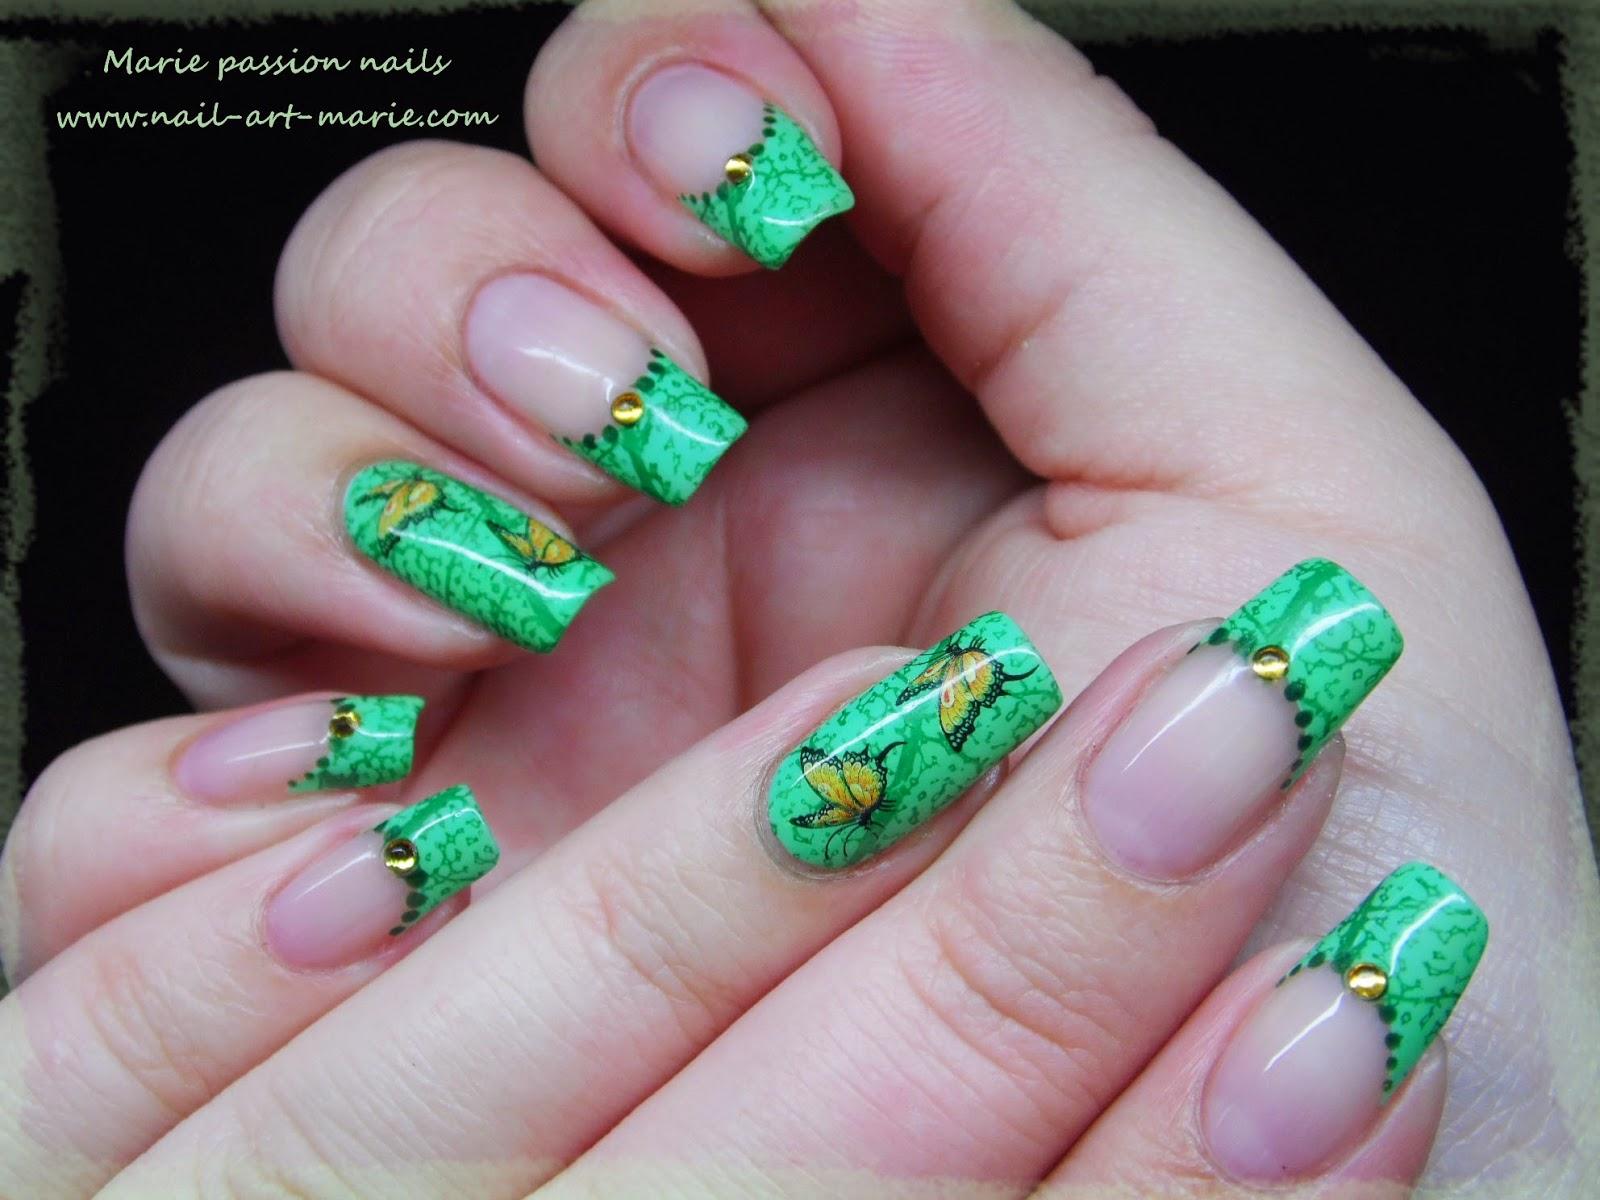 Nail art French nature1